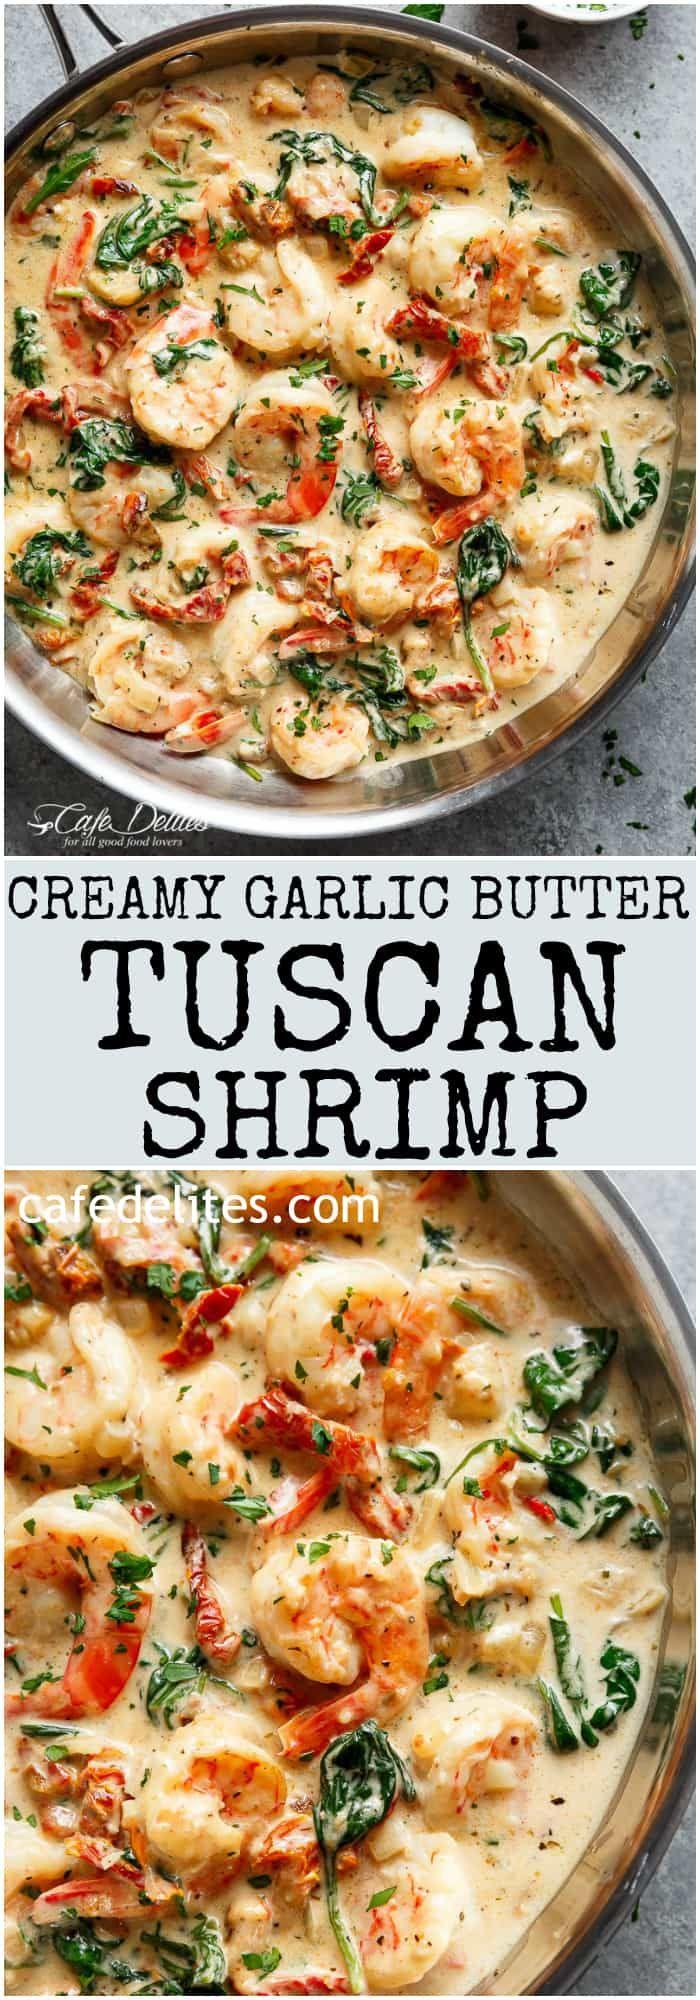 Creamy Garlic Butter Tuscan Shrimp Coated In A Light And Creamy Sauce Filled With Garlic Sun Dried Tomat Comida Pasta Con Mariscos Recetas De Comida